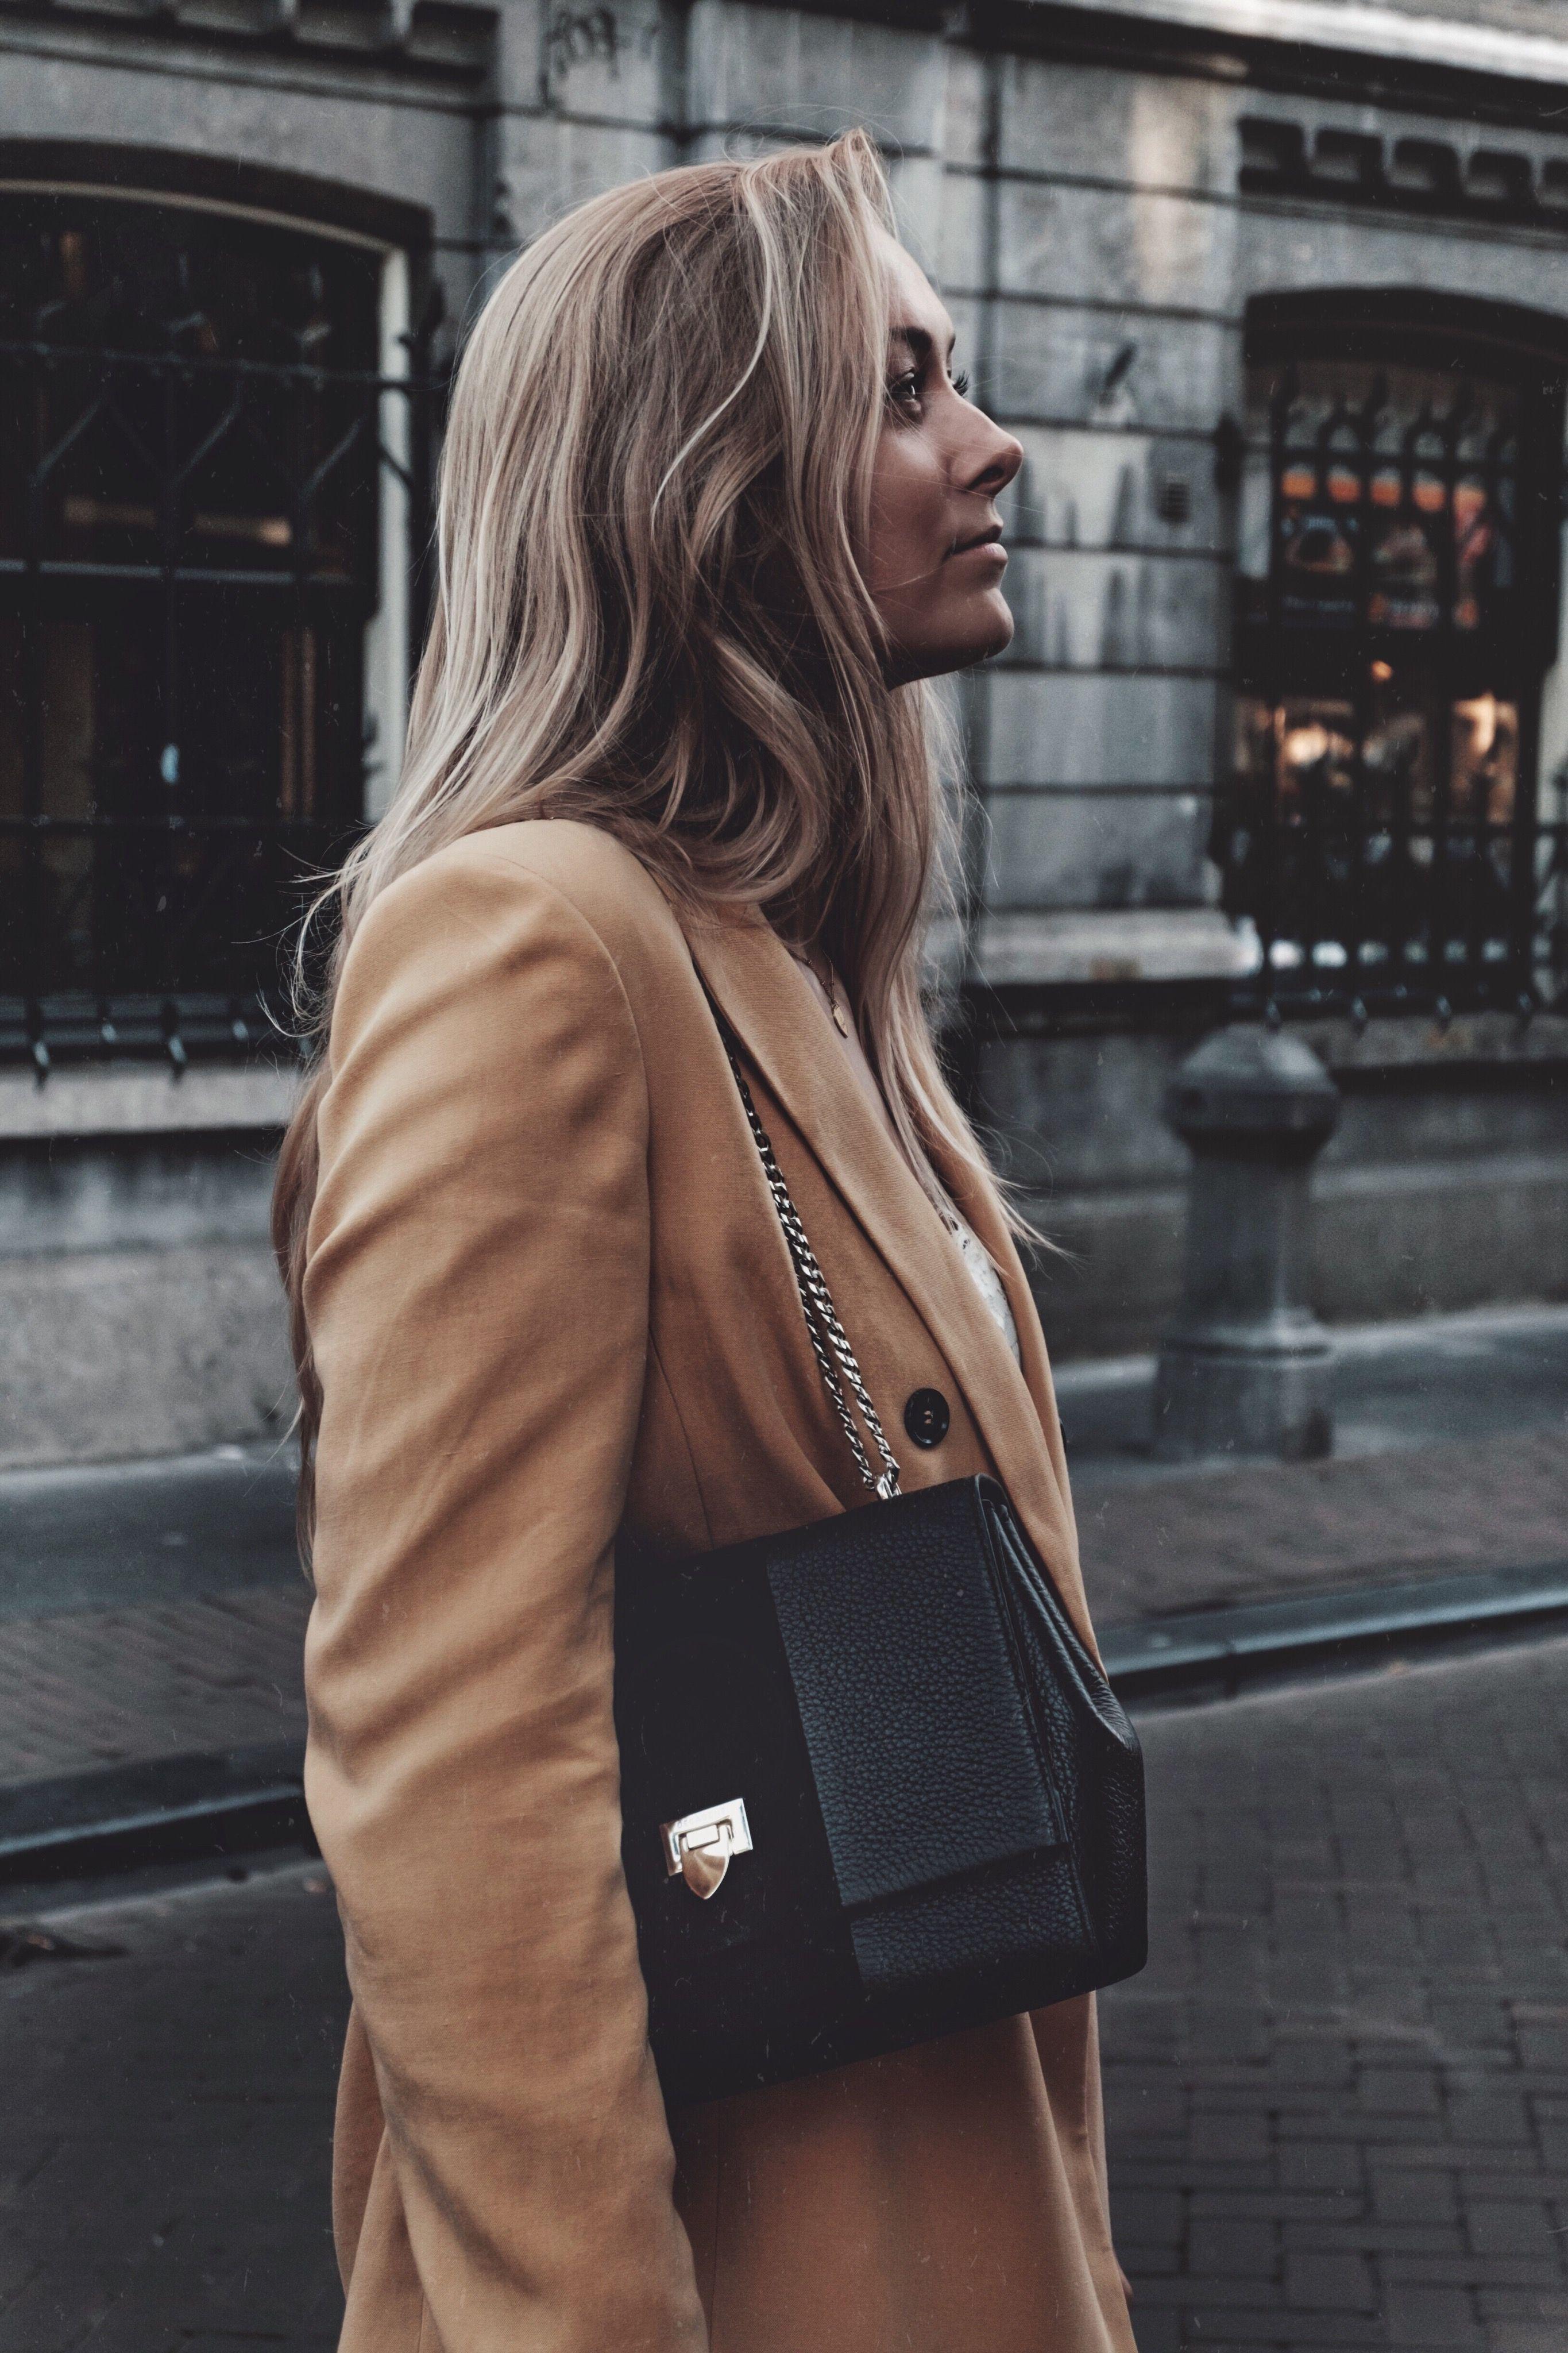 Sophie Feenstra Wearing Decadent Heidi Medium Bag In Black